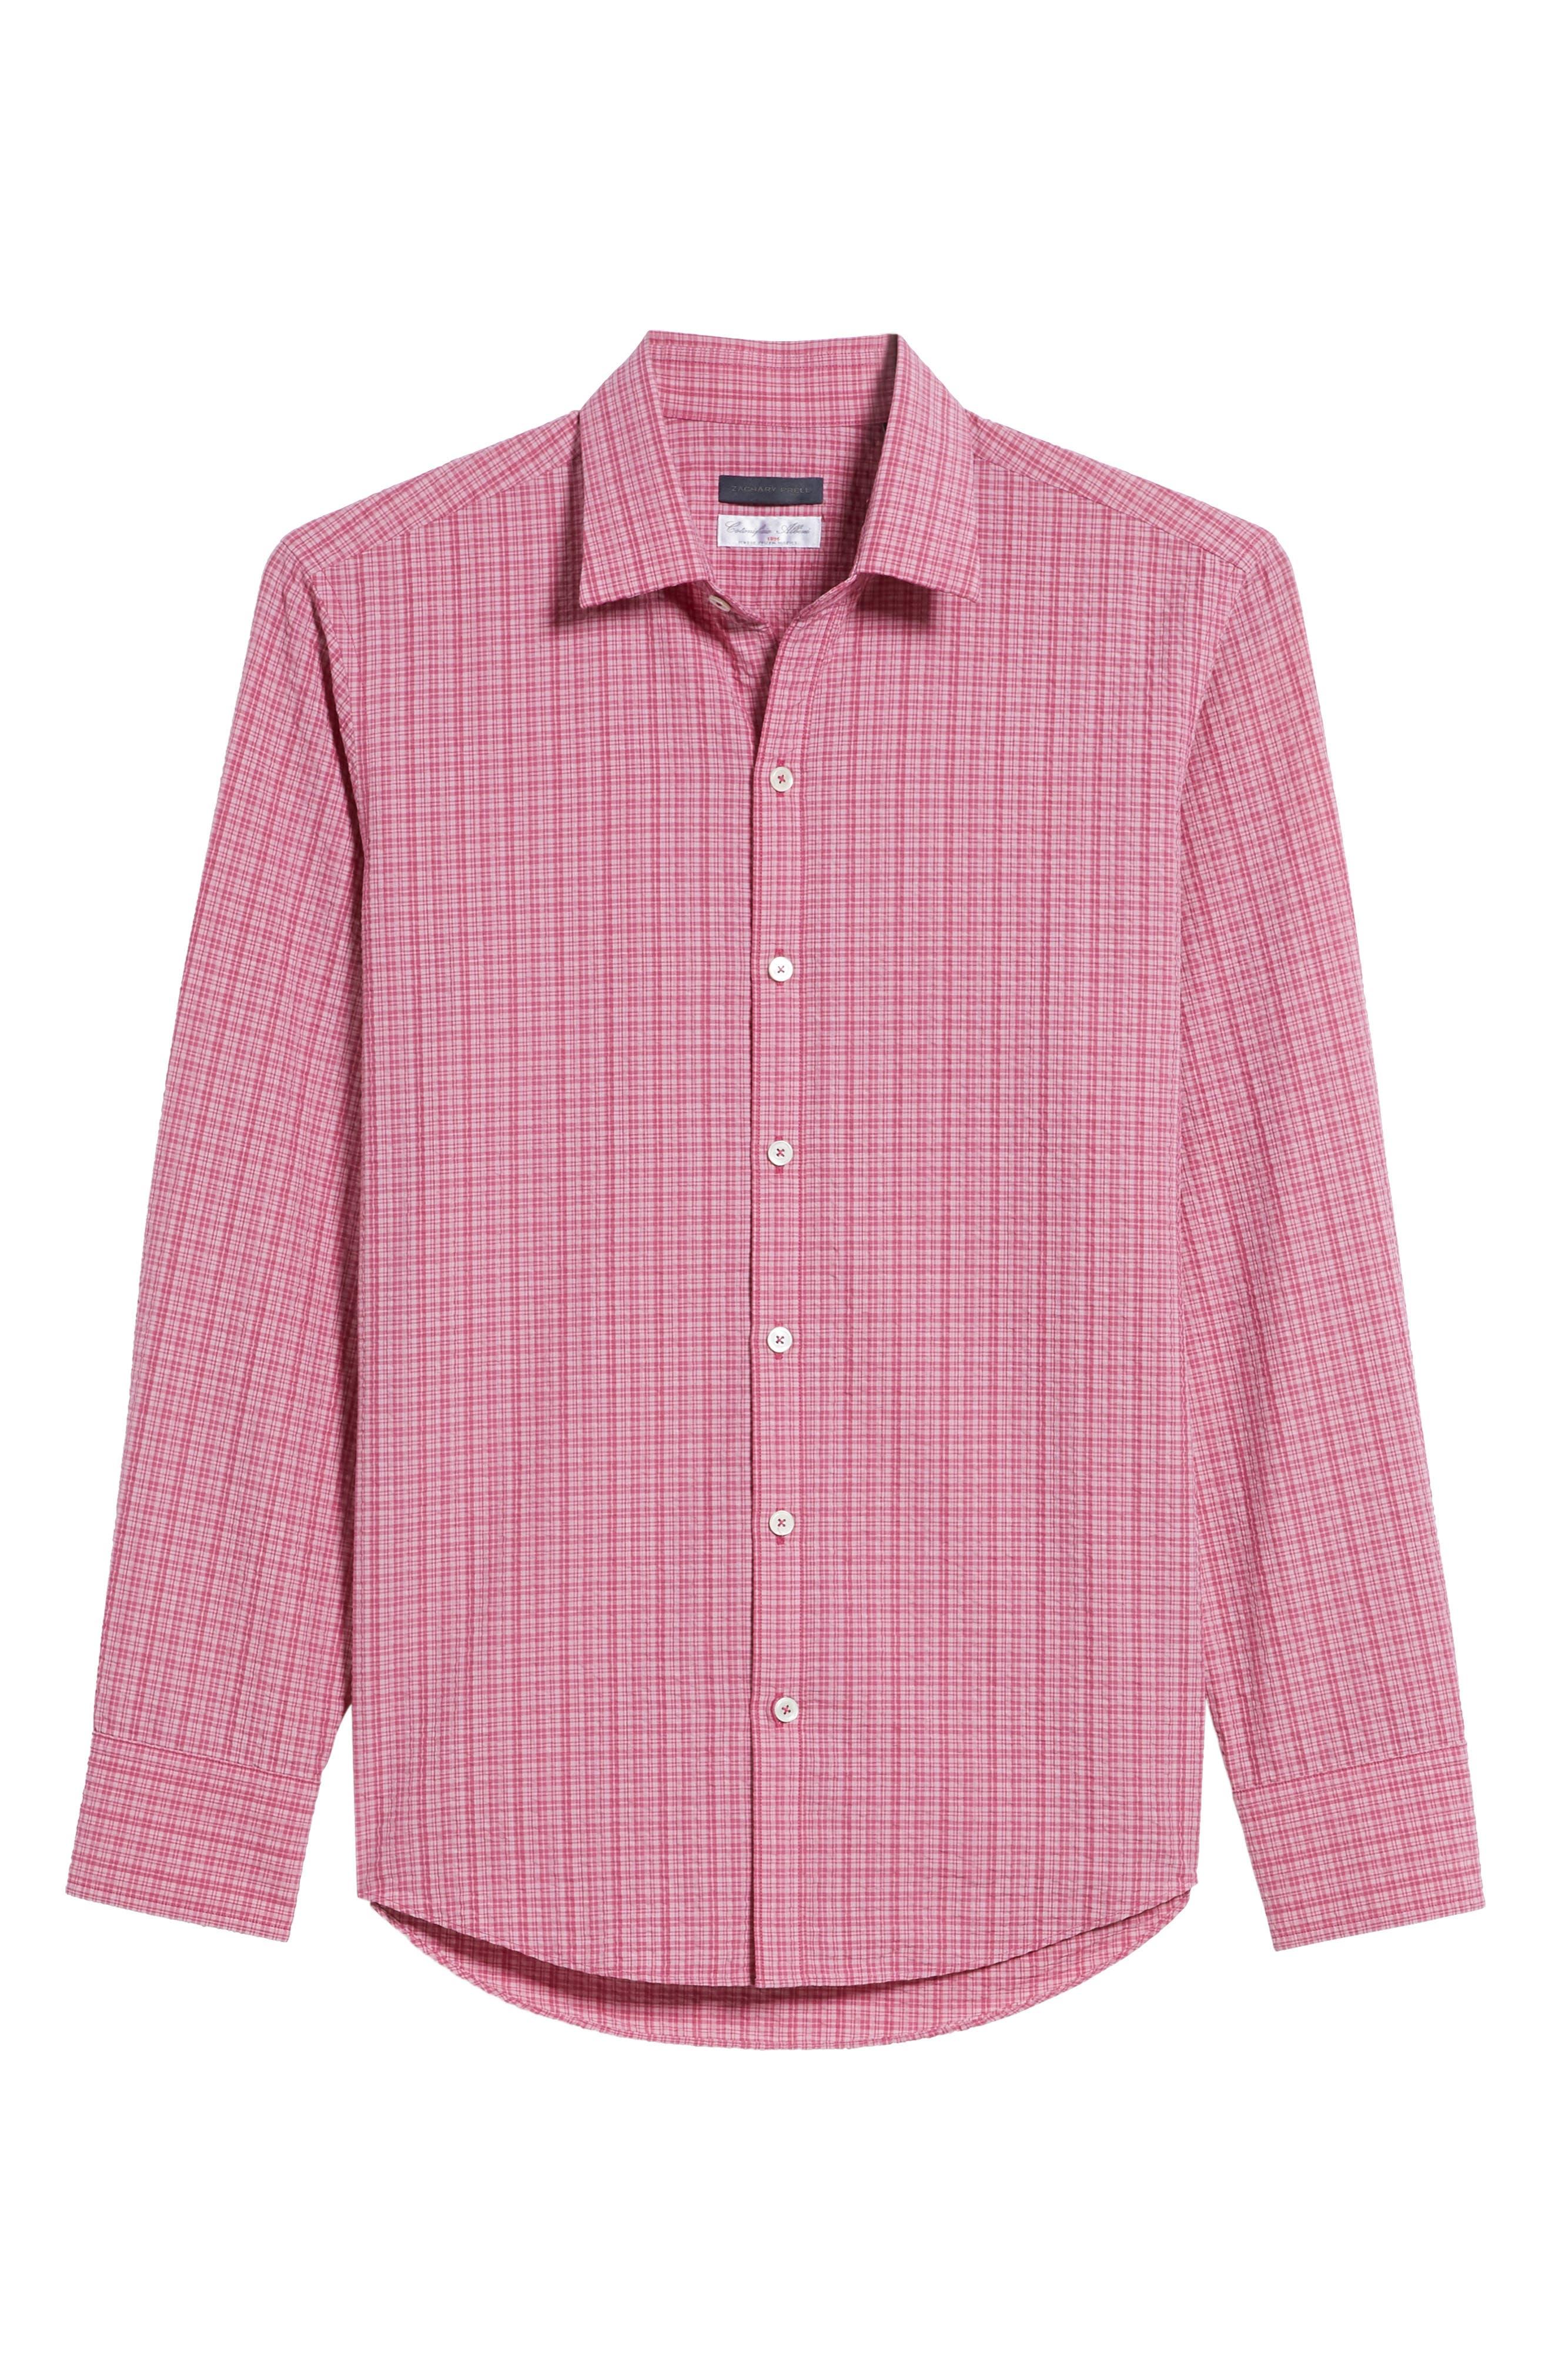 Italo Seersucker Woven Sport Shirt,                             Alternate thumbnail 6, color,                             Dark Pink